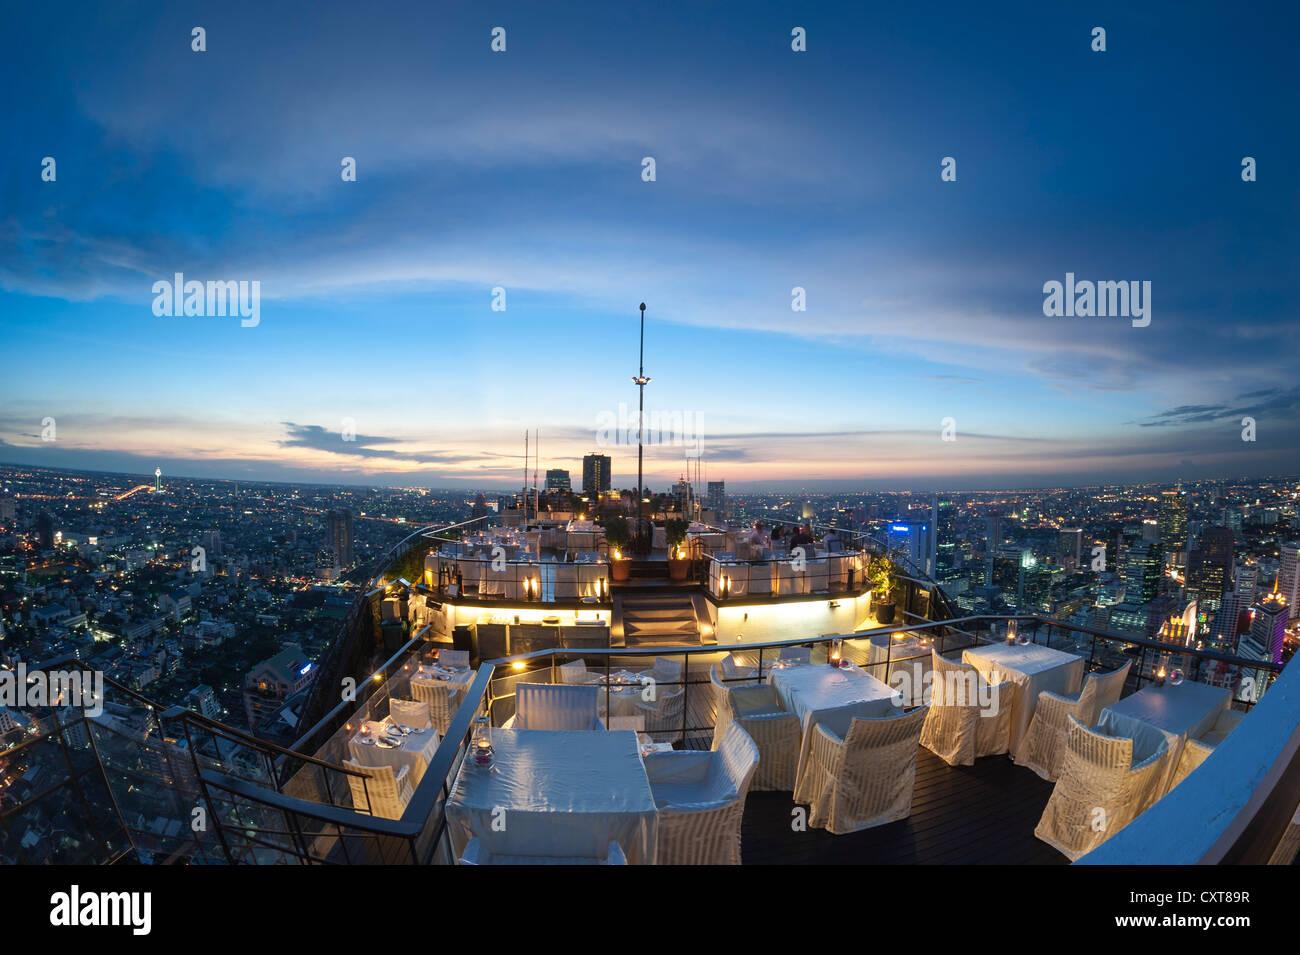 View of the city, Vertigo Bar and Restaurant, roof of the Banyan Tree Hotel, at dusk Bangkok, Thailand, Asia - Stock Image